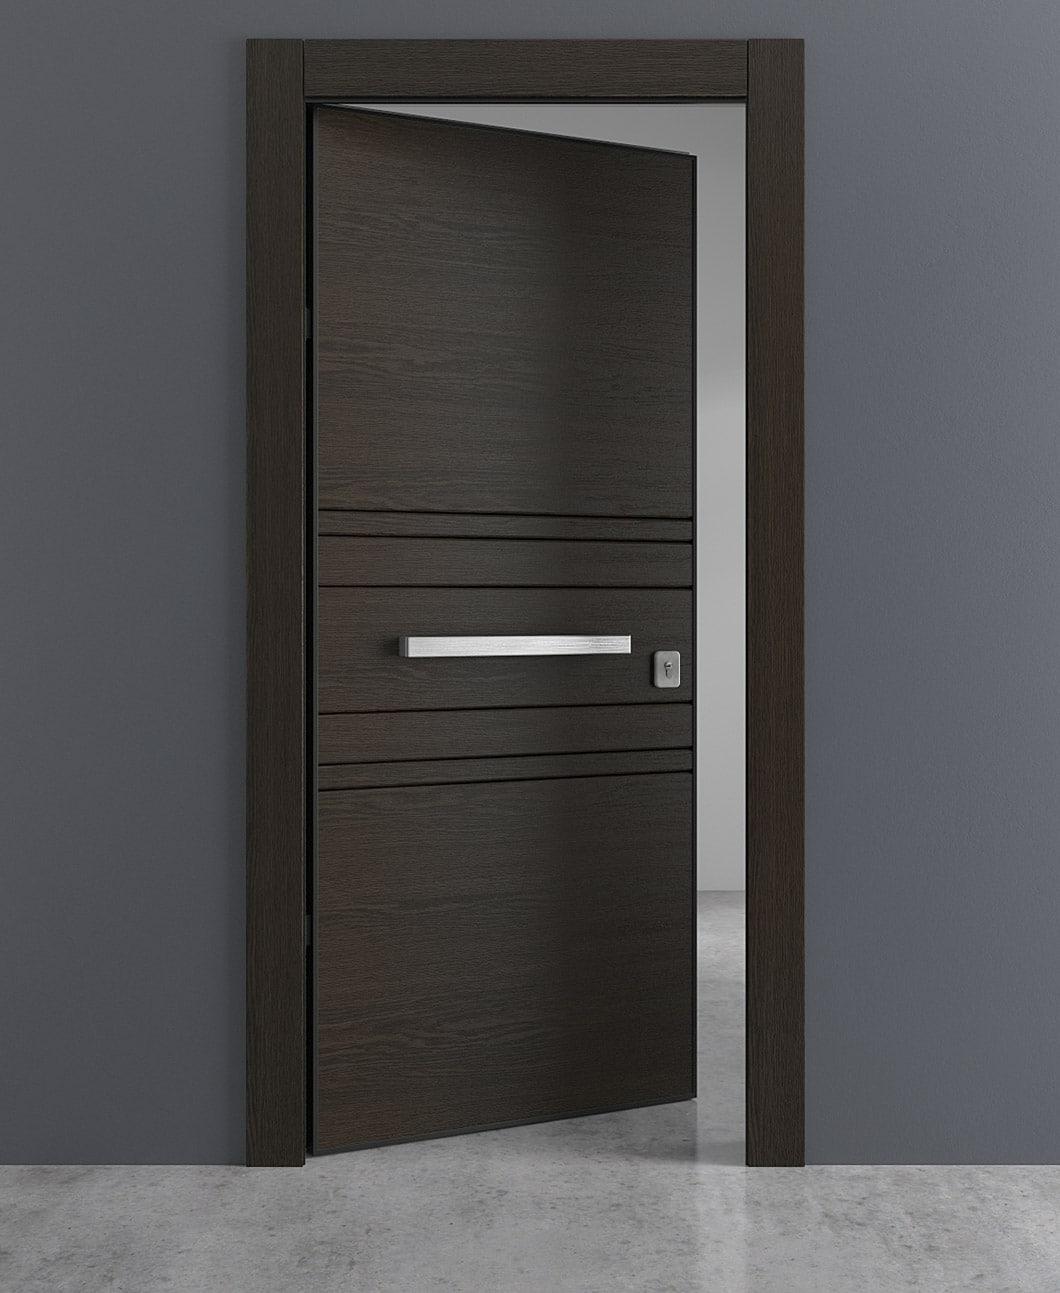 Sabadoor Doors Παντογραφικές Θωρακισμένες Πόρτες